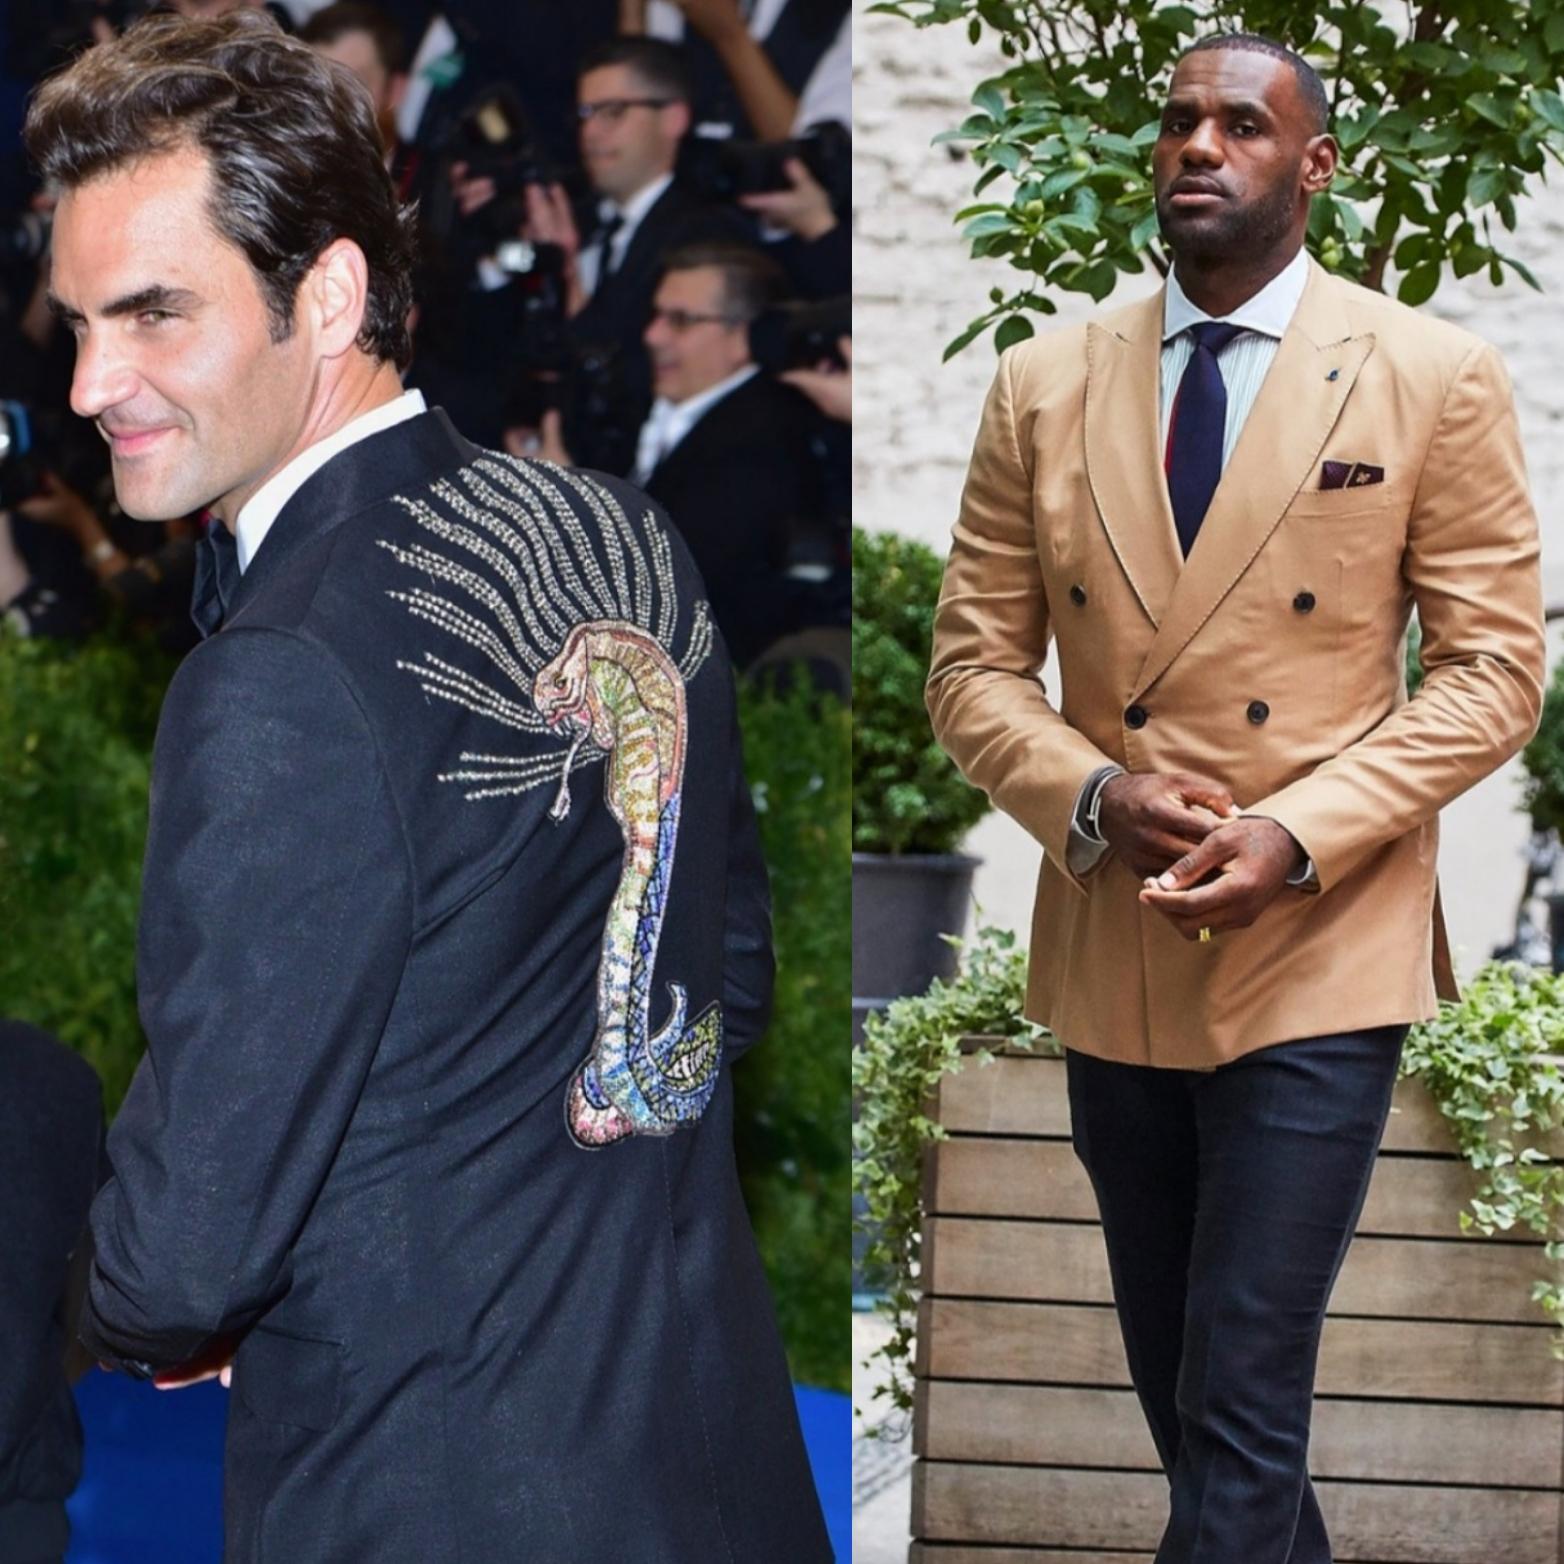 Roger Federer, Lebron James Named To Vanity Fair's 2017 International Best-Dressed List